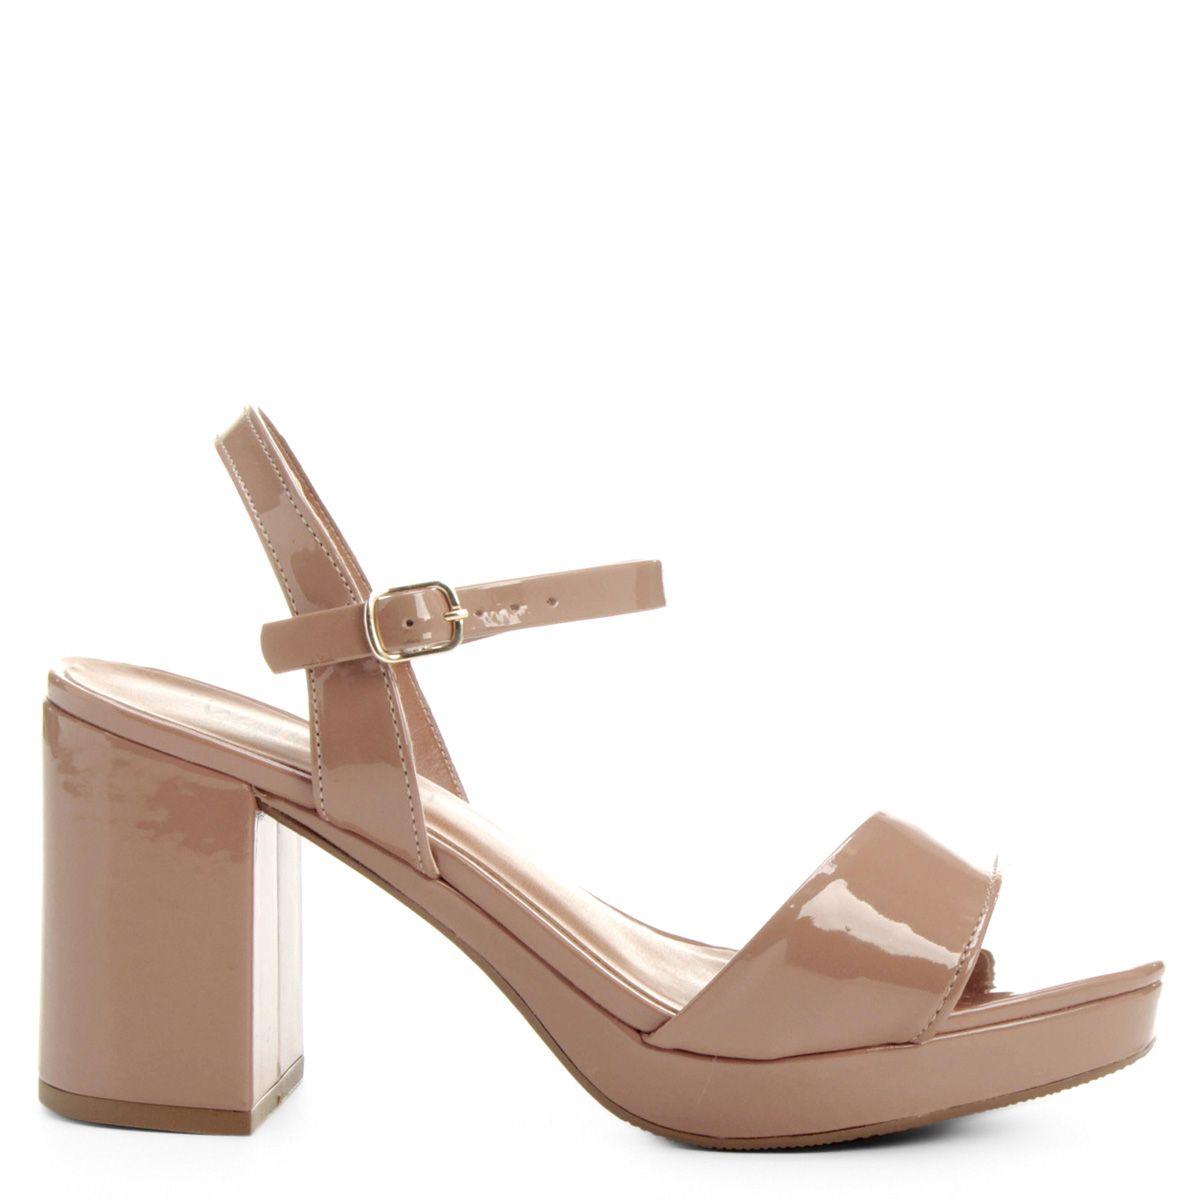 ab0013da8 Compre Sandália Walkabout Meia Pata Marinho na Zattini a nova loja de moda  online da Netshoes